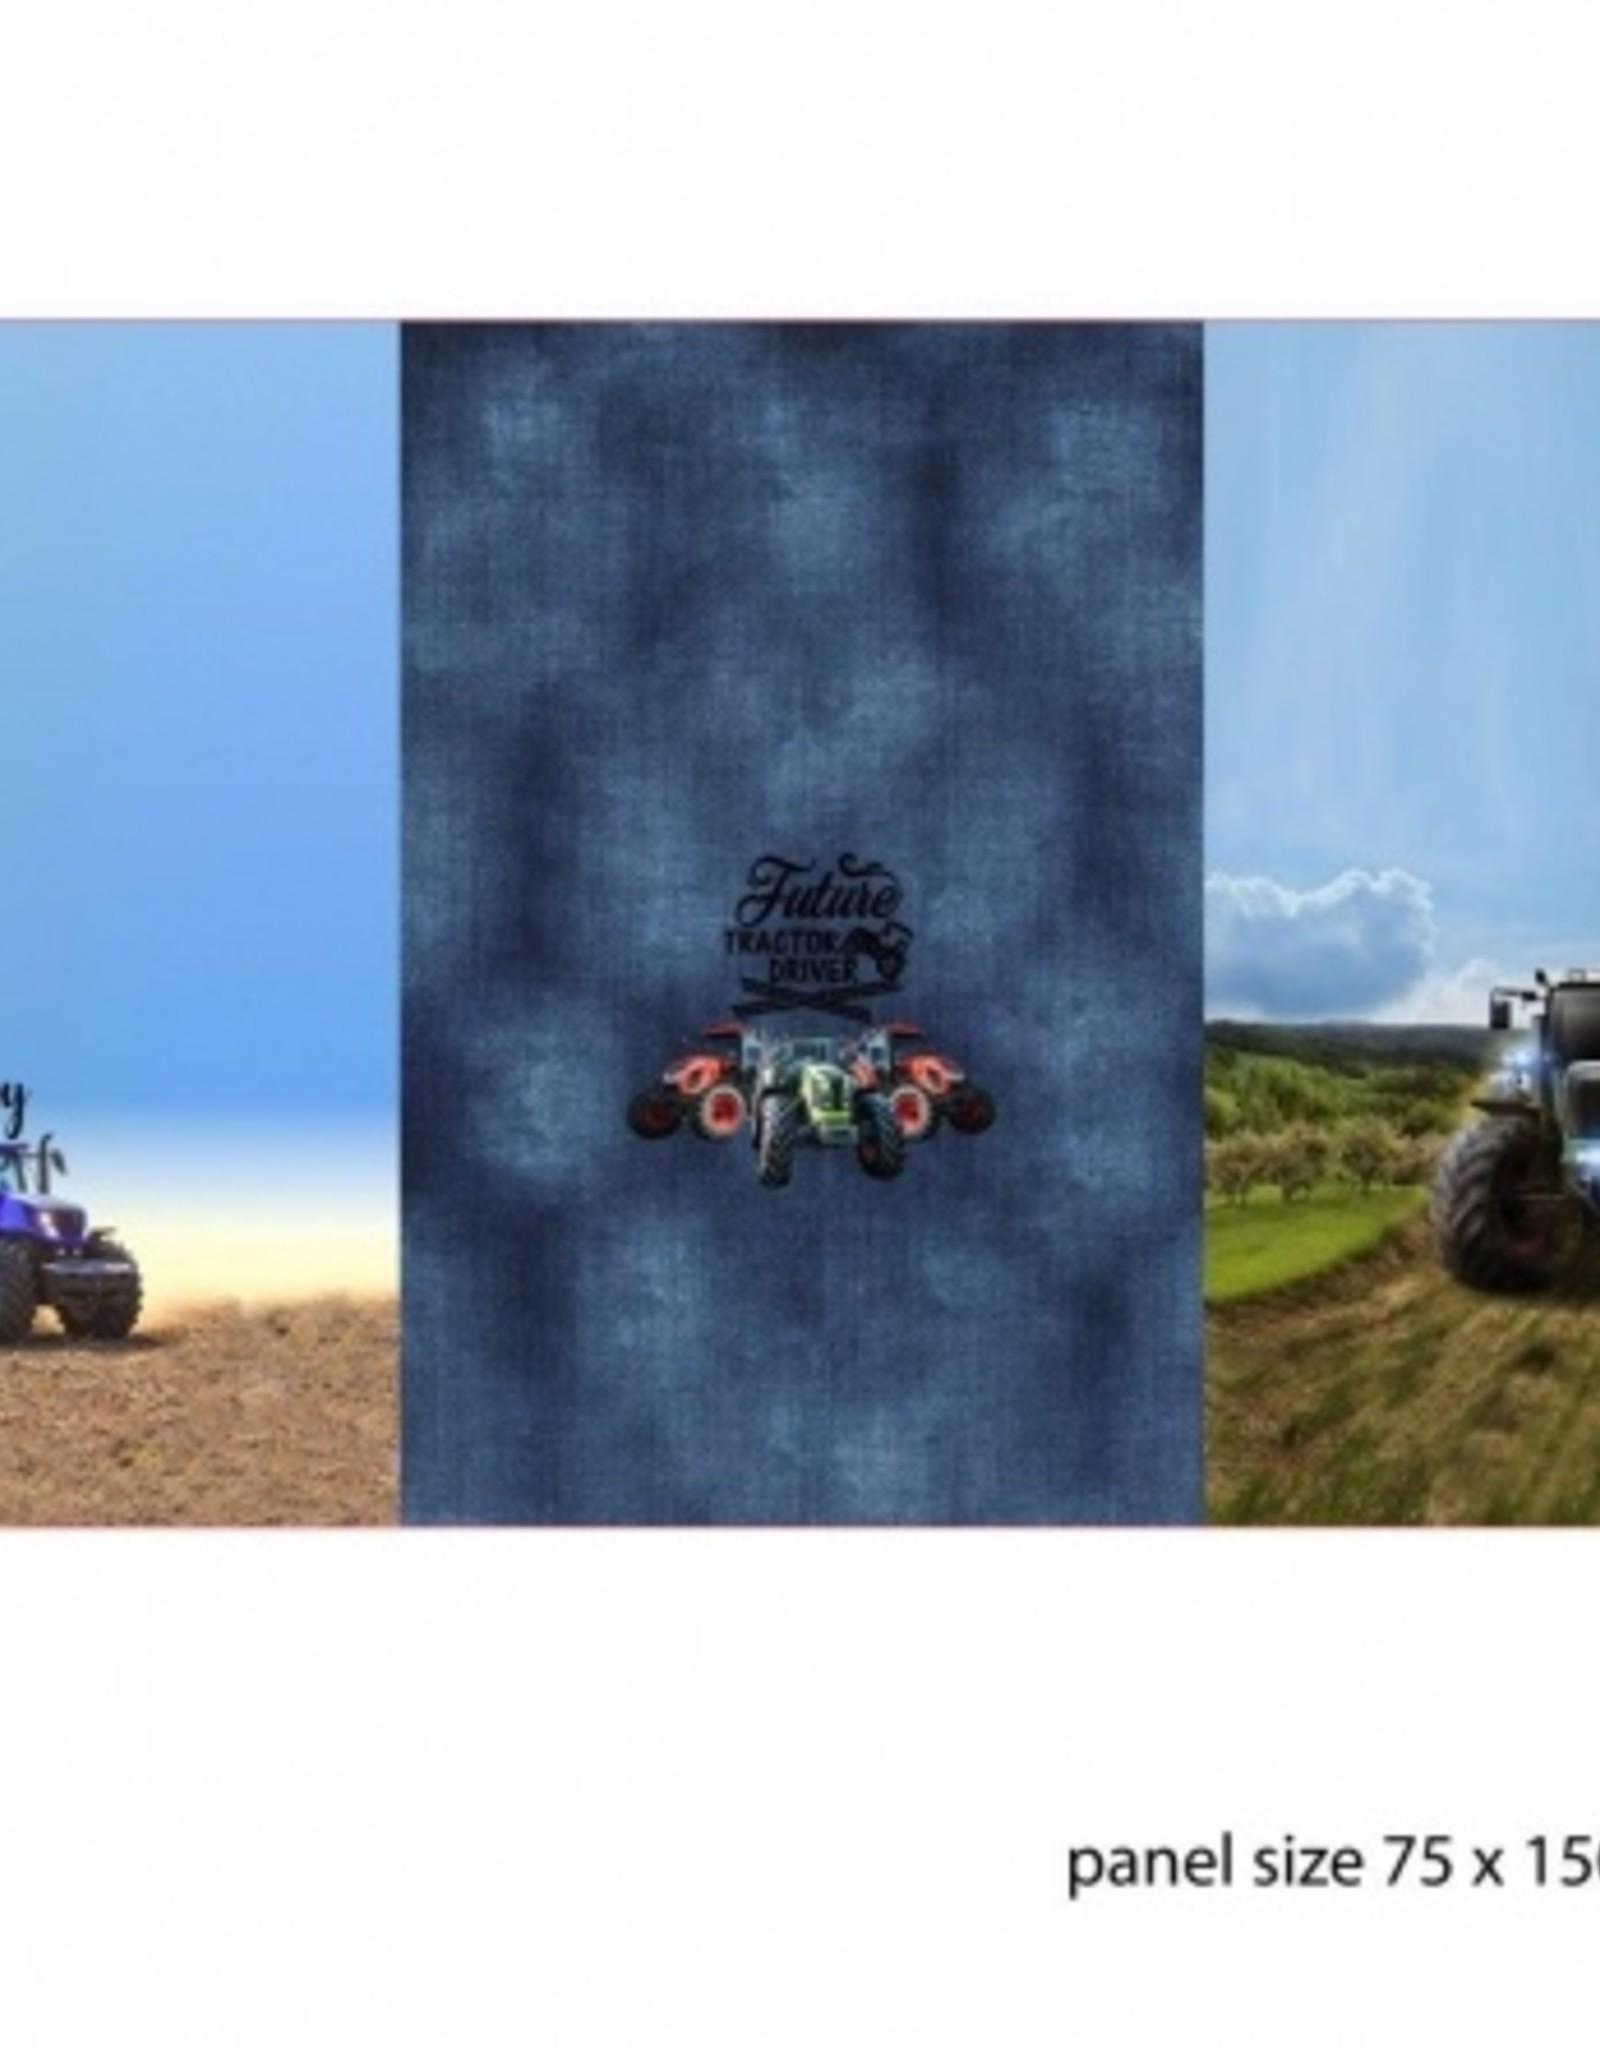 Paneel 3x tractor op french terry